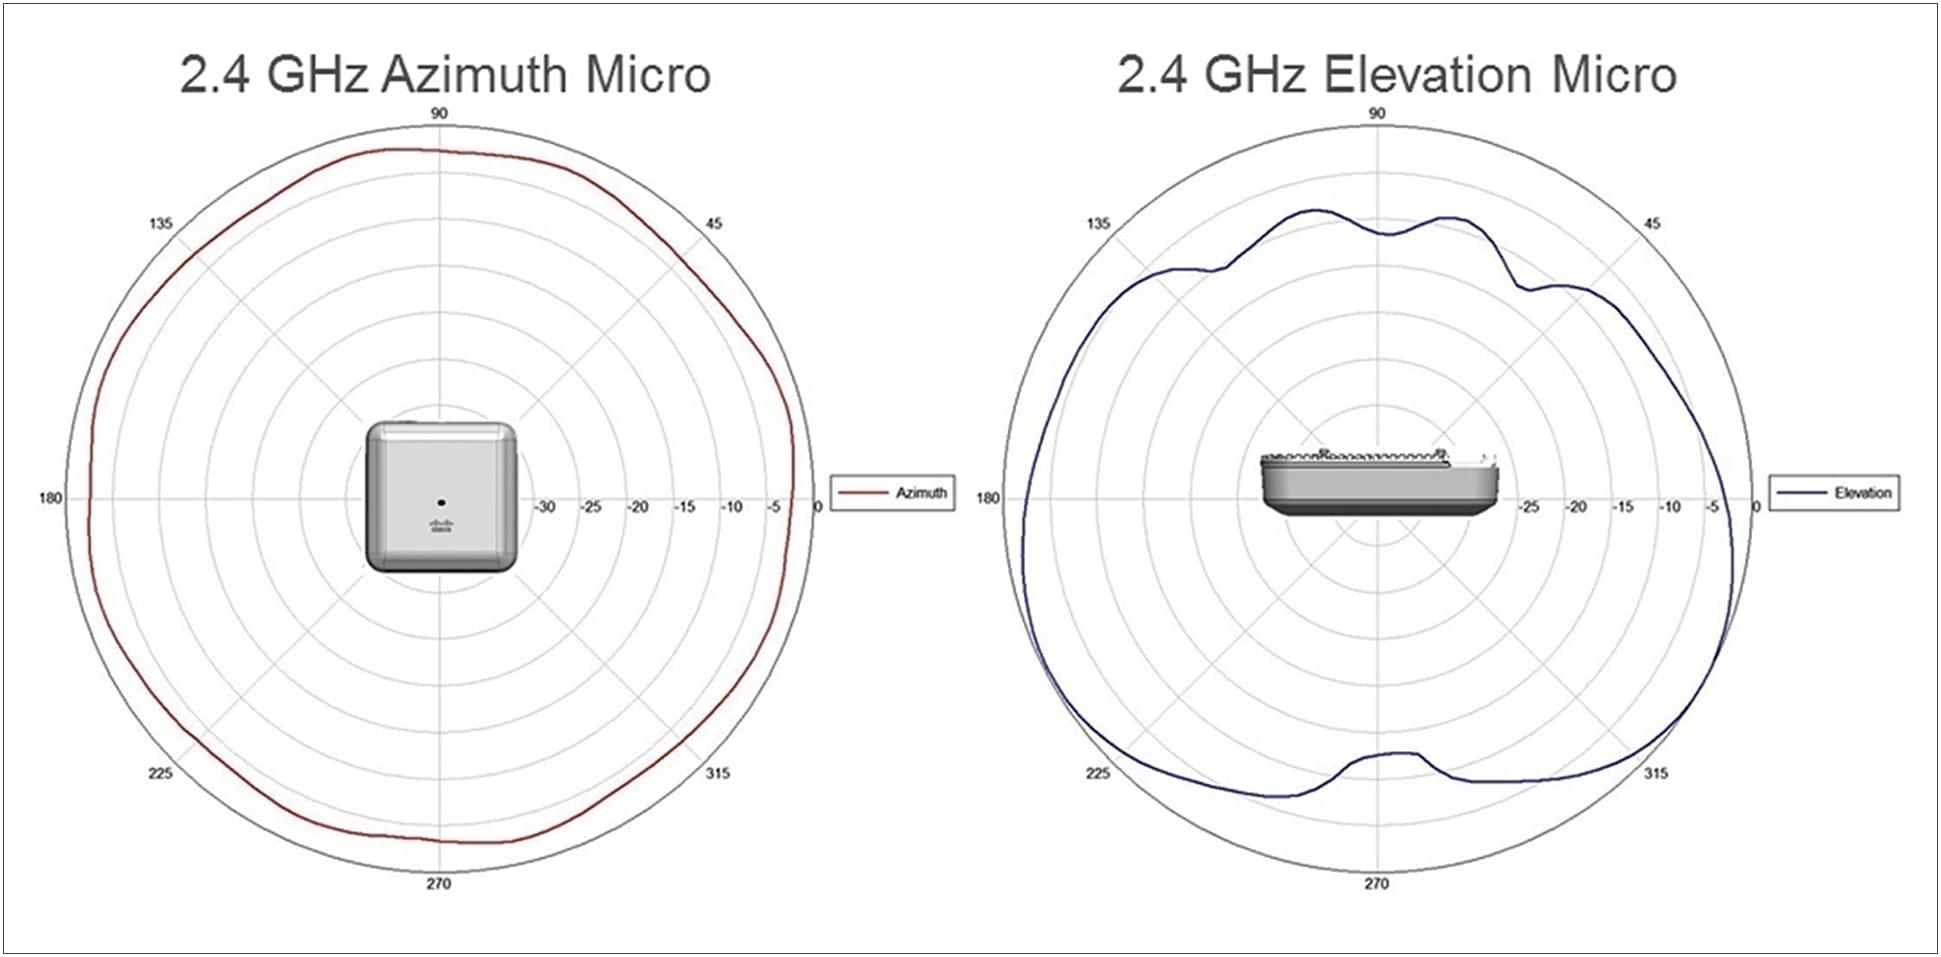 2.4 GHz Azimuth Micro